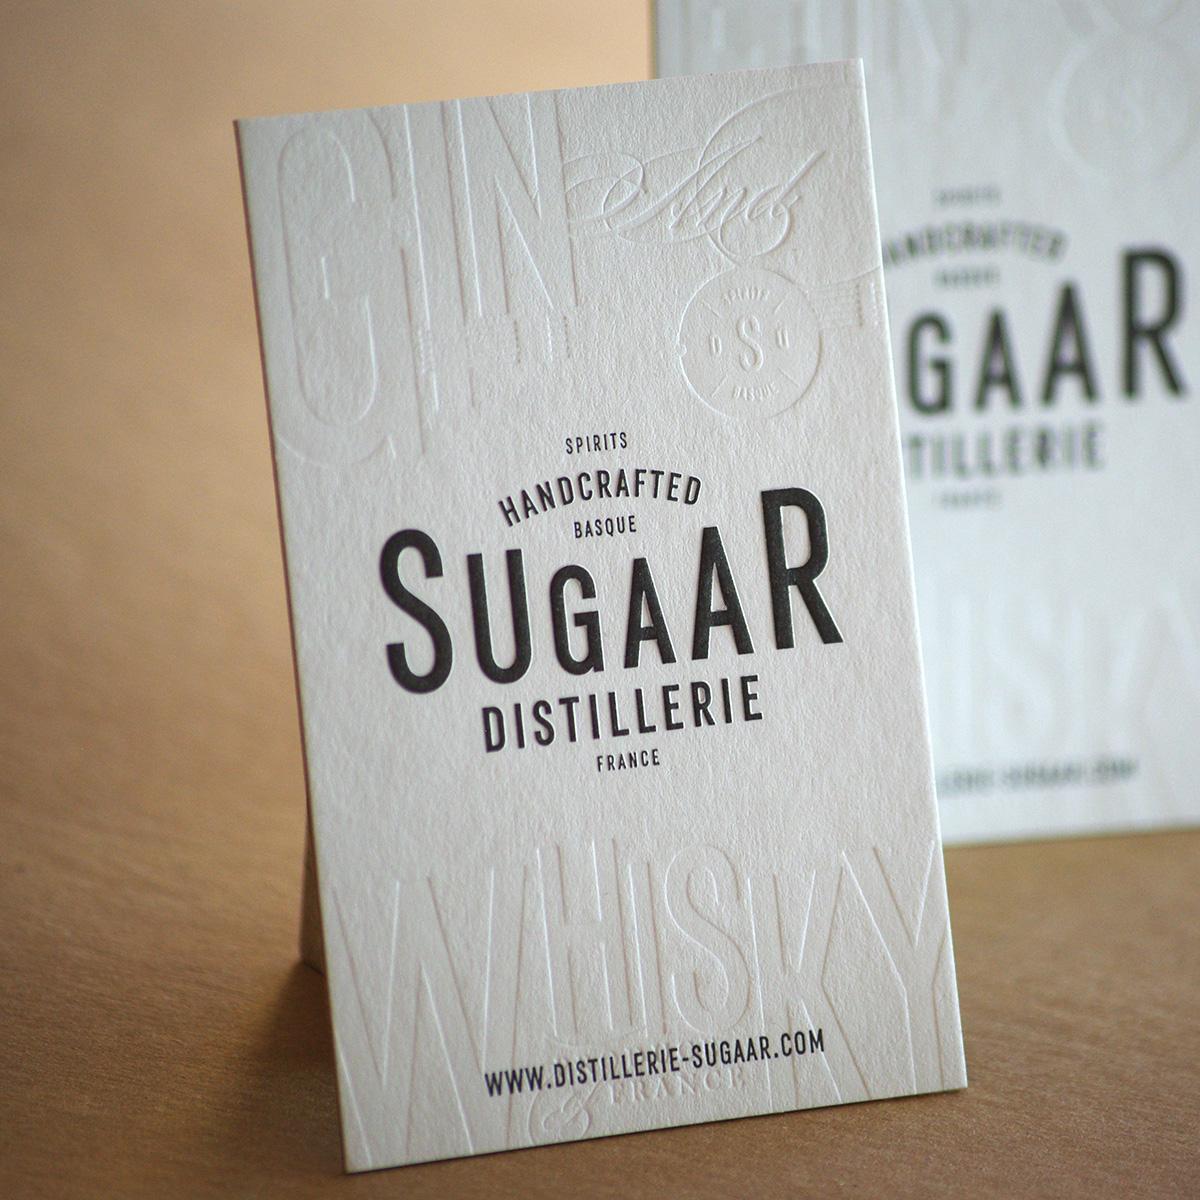 Carte De Visite Distillerie Sugaar R Dbossage Pur 1 Couleur Gaufrage V Contrecollage Oldmill Kraft